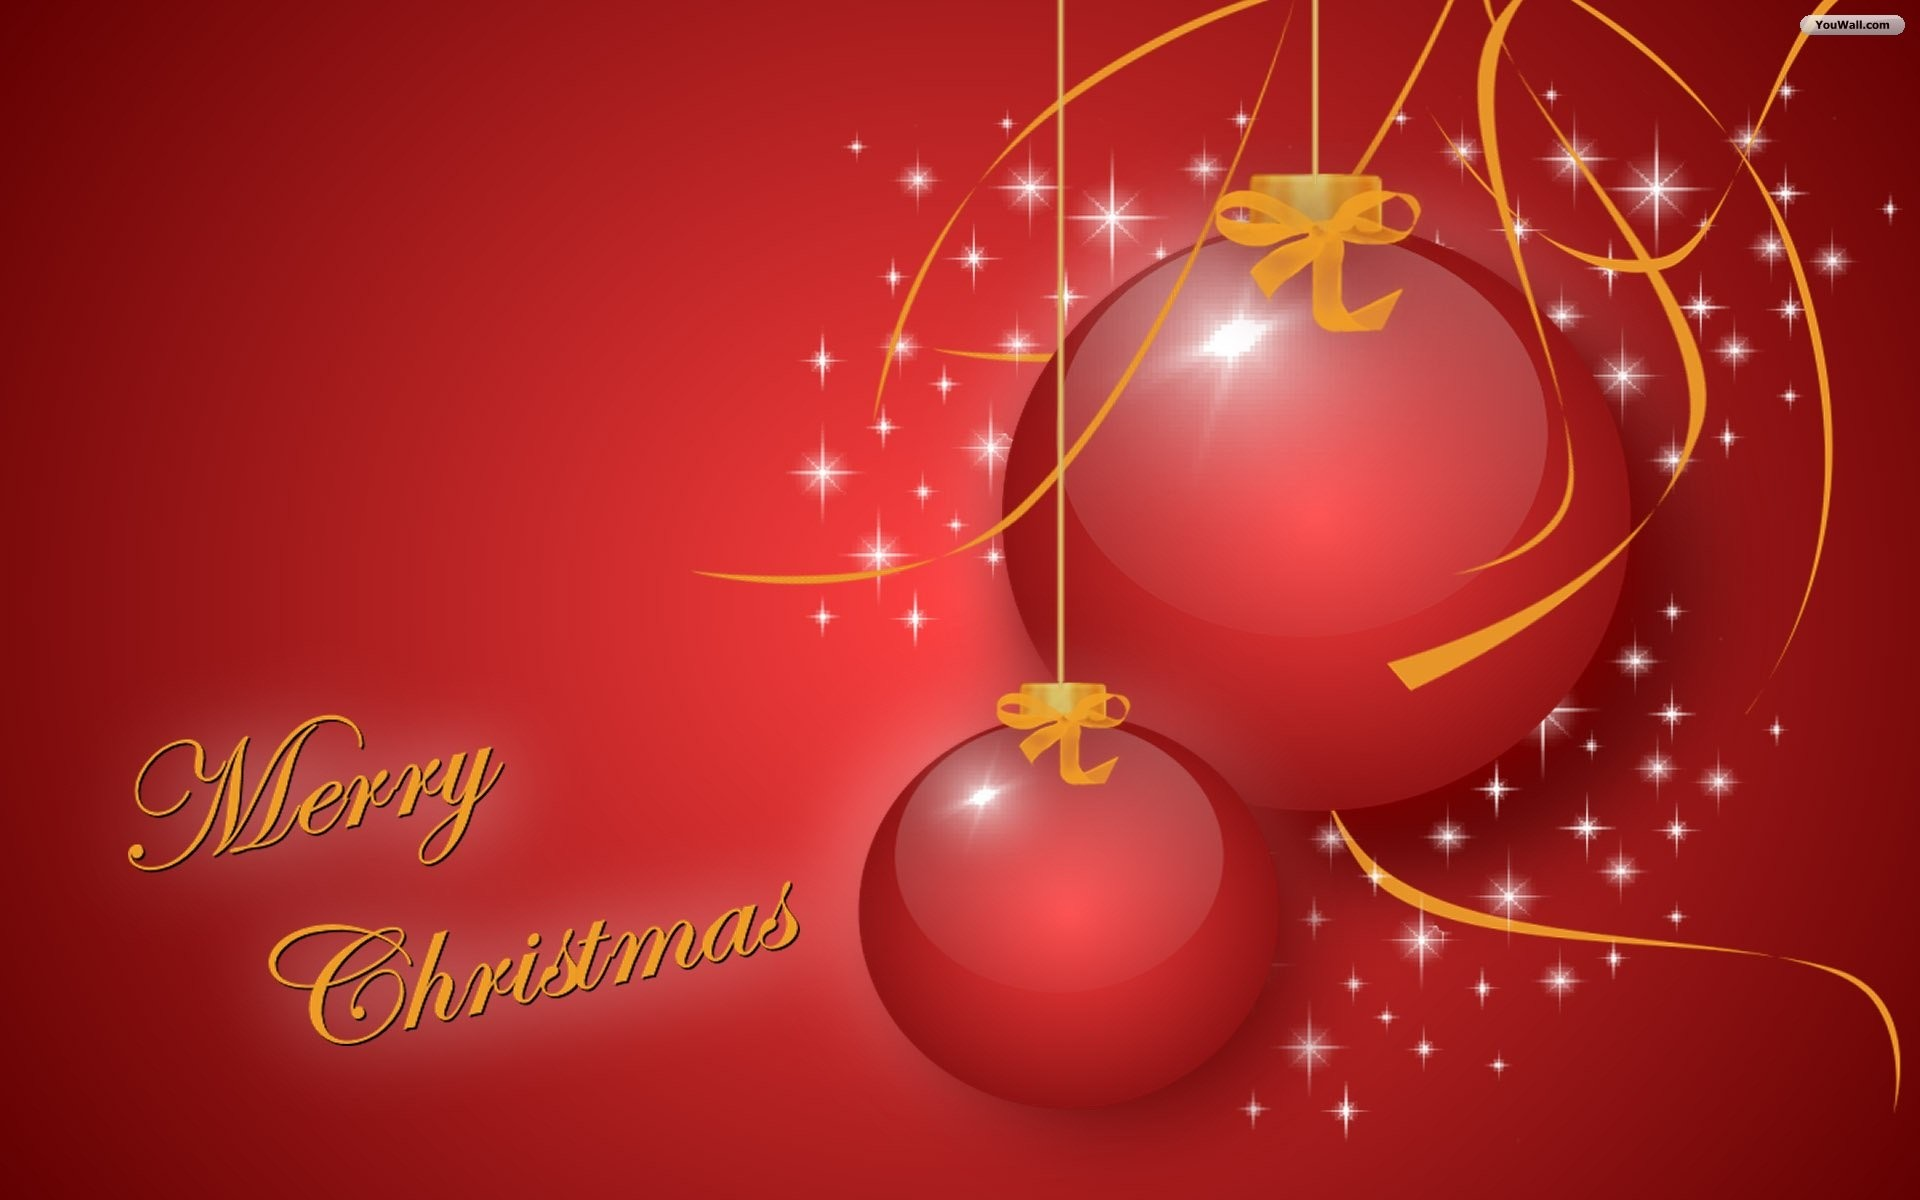 Merry Christmas Wallpaper – wallpaper,wallpapers,free wallpaper .